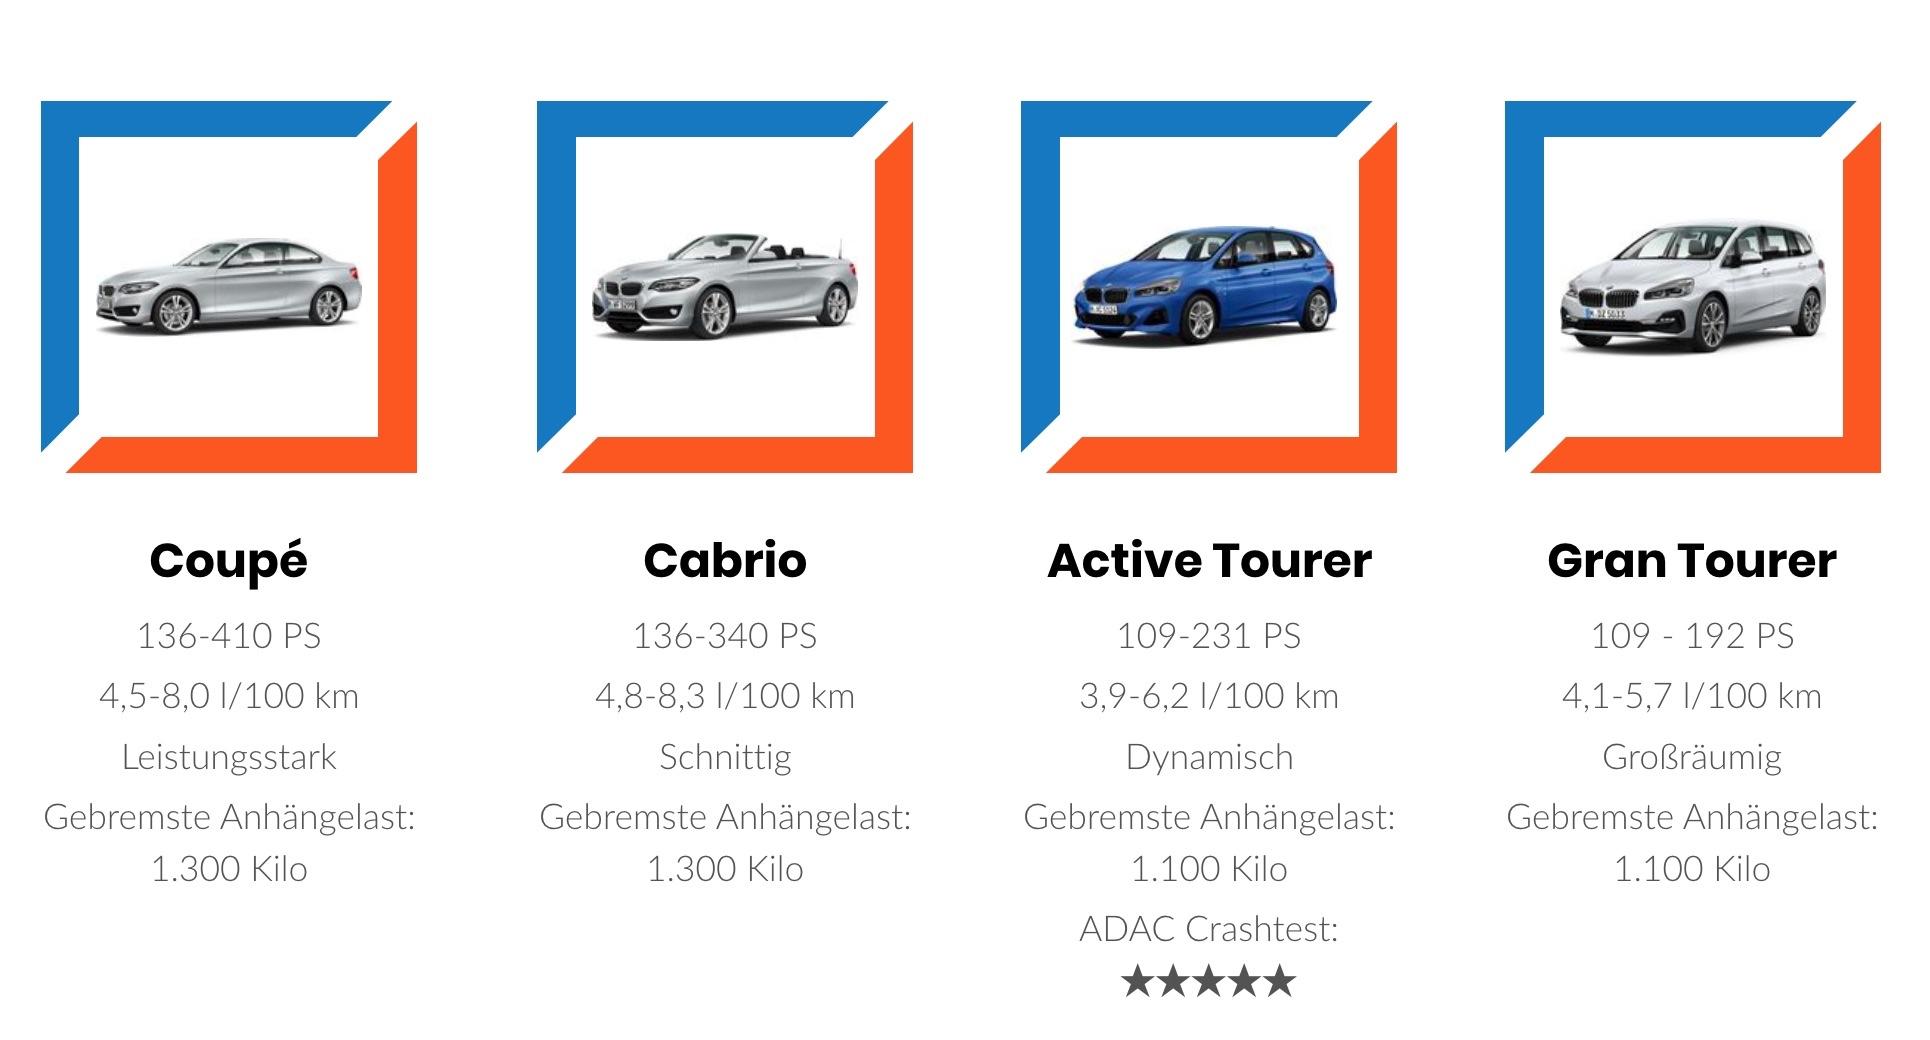 Die BMW 2er Modelle